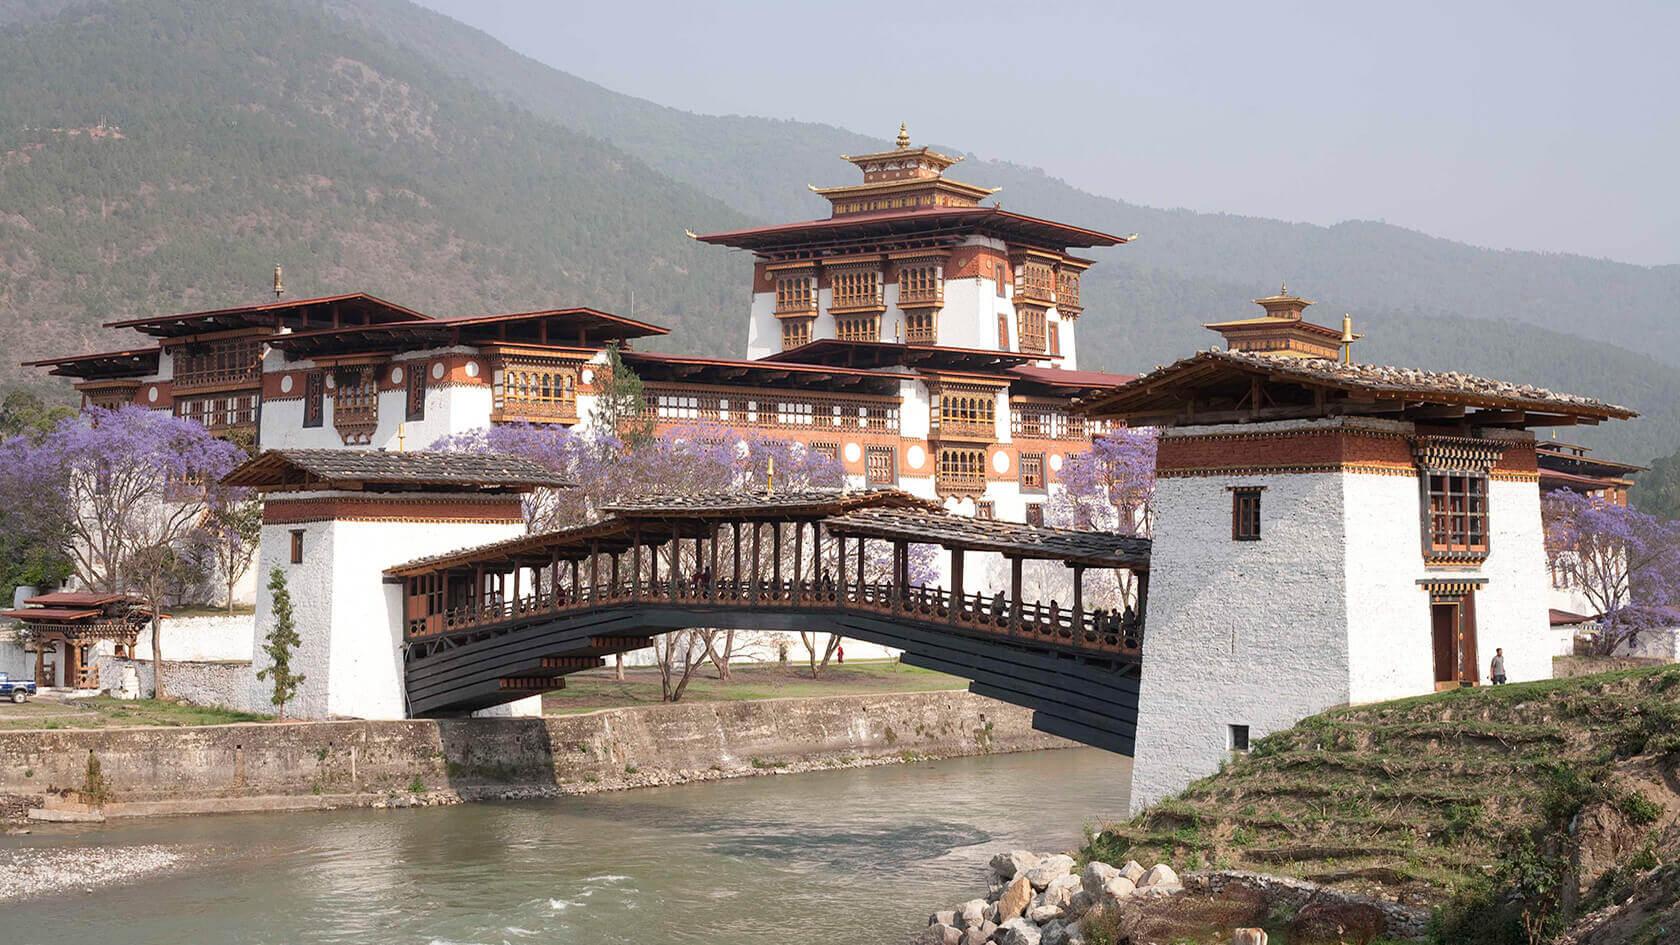 EXPLORING HISTORY IN BHUTAN